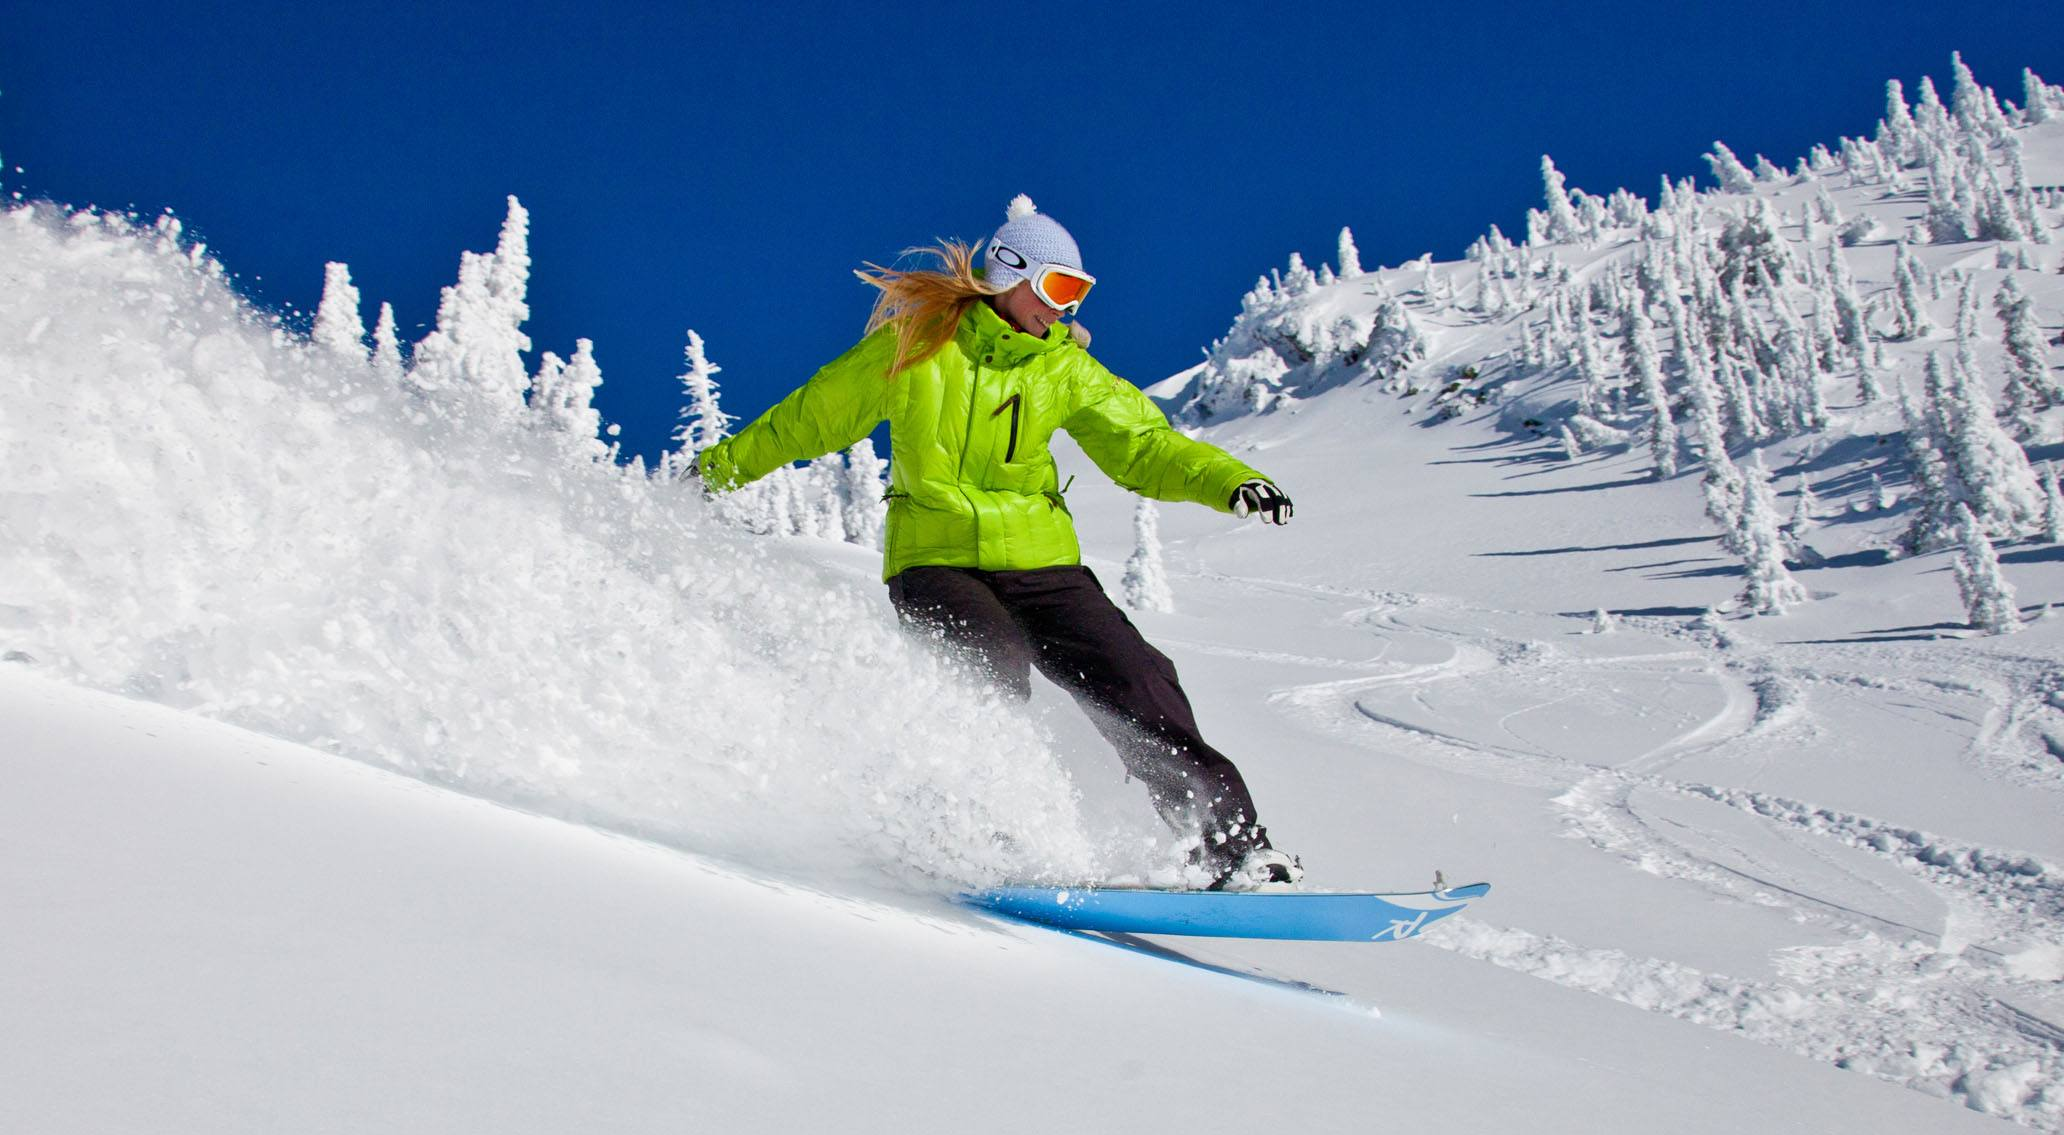 Keiran barret big white ski resort feature